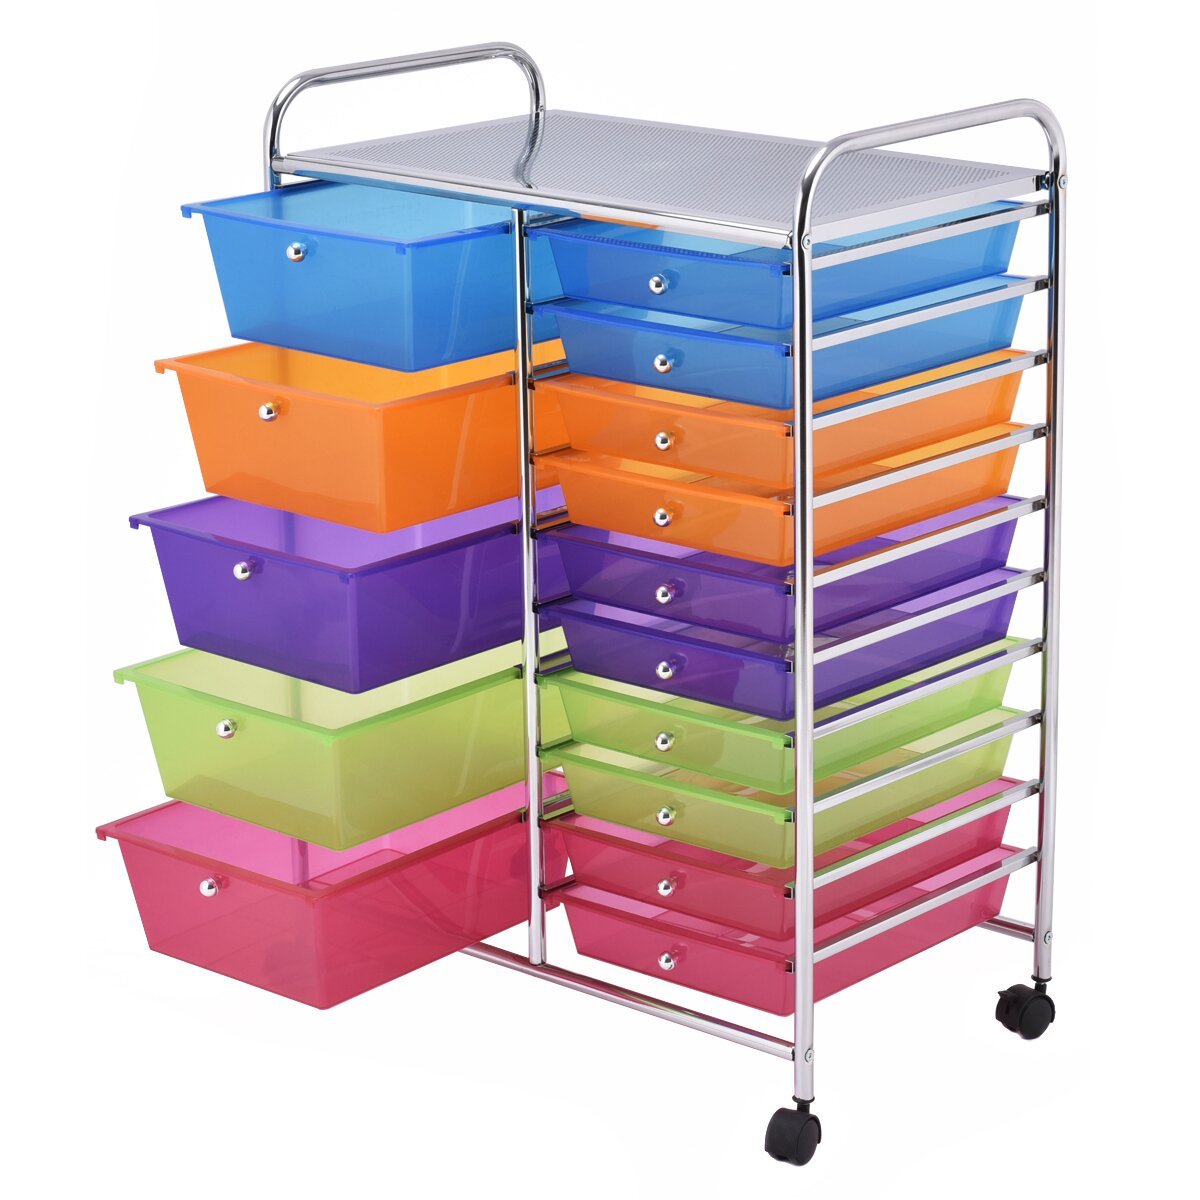 Gymax Rolling Storage Cart 15 Drawers Organize Shelf Offi...